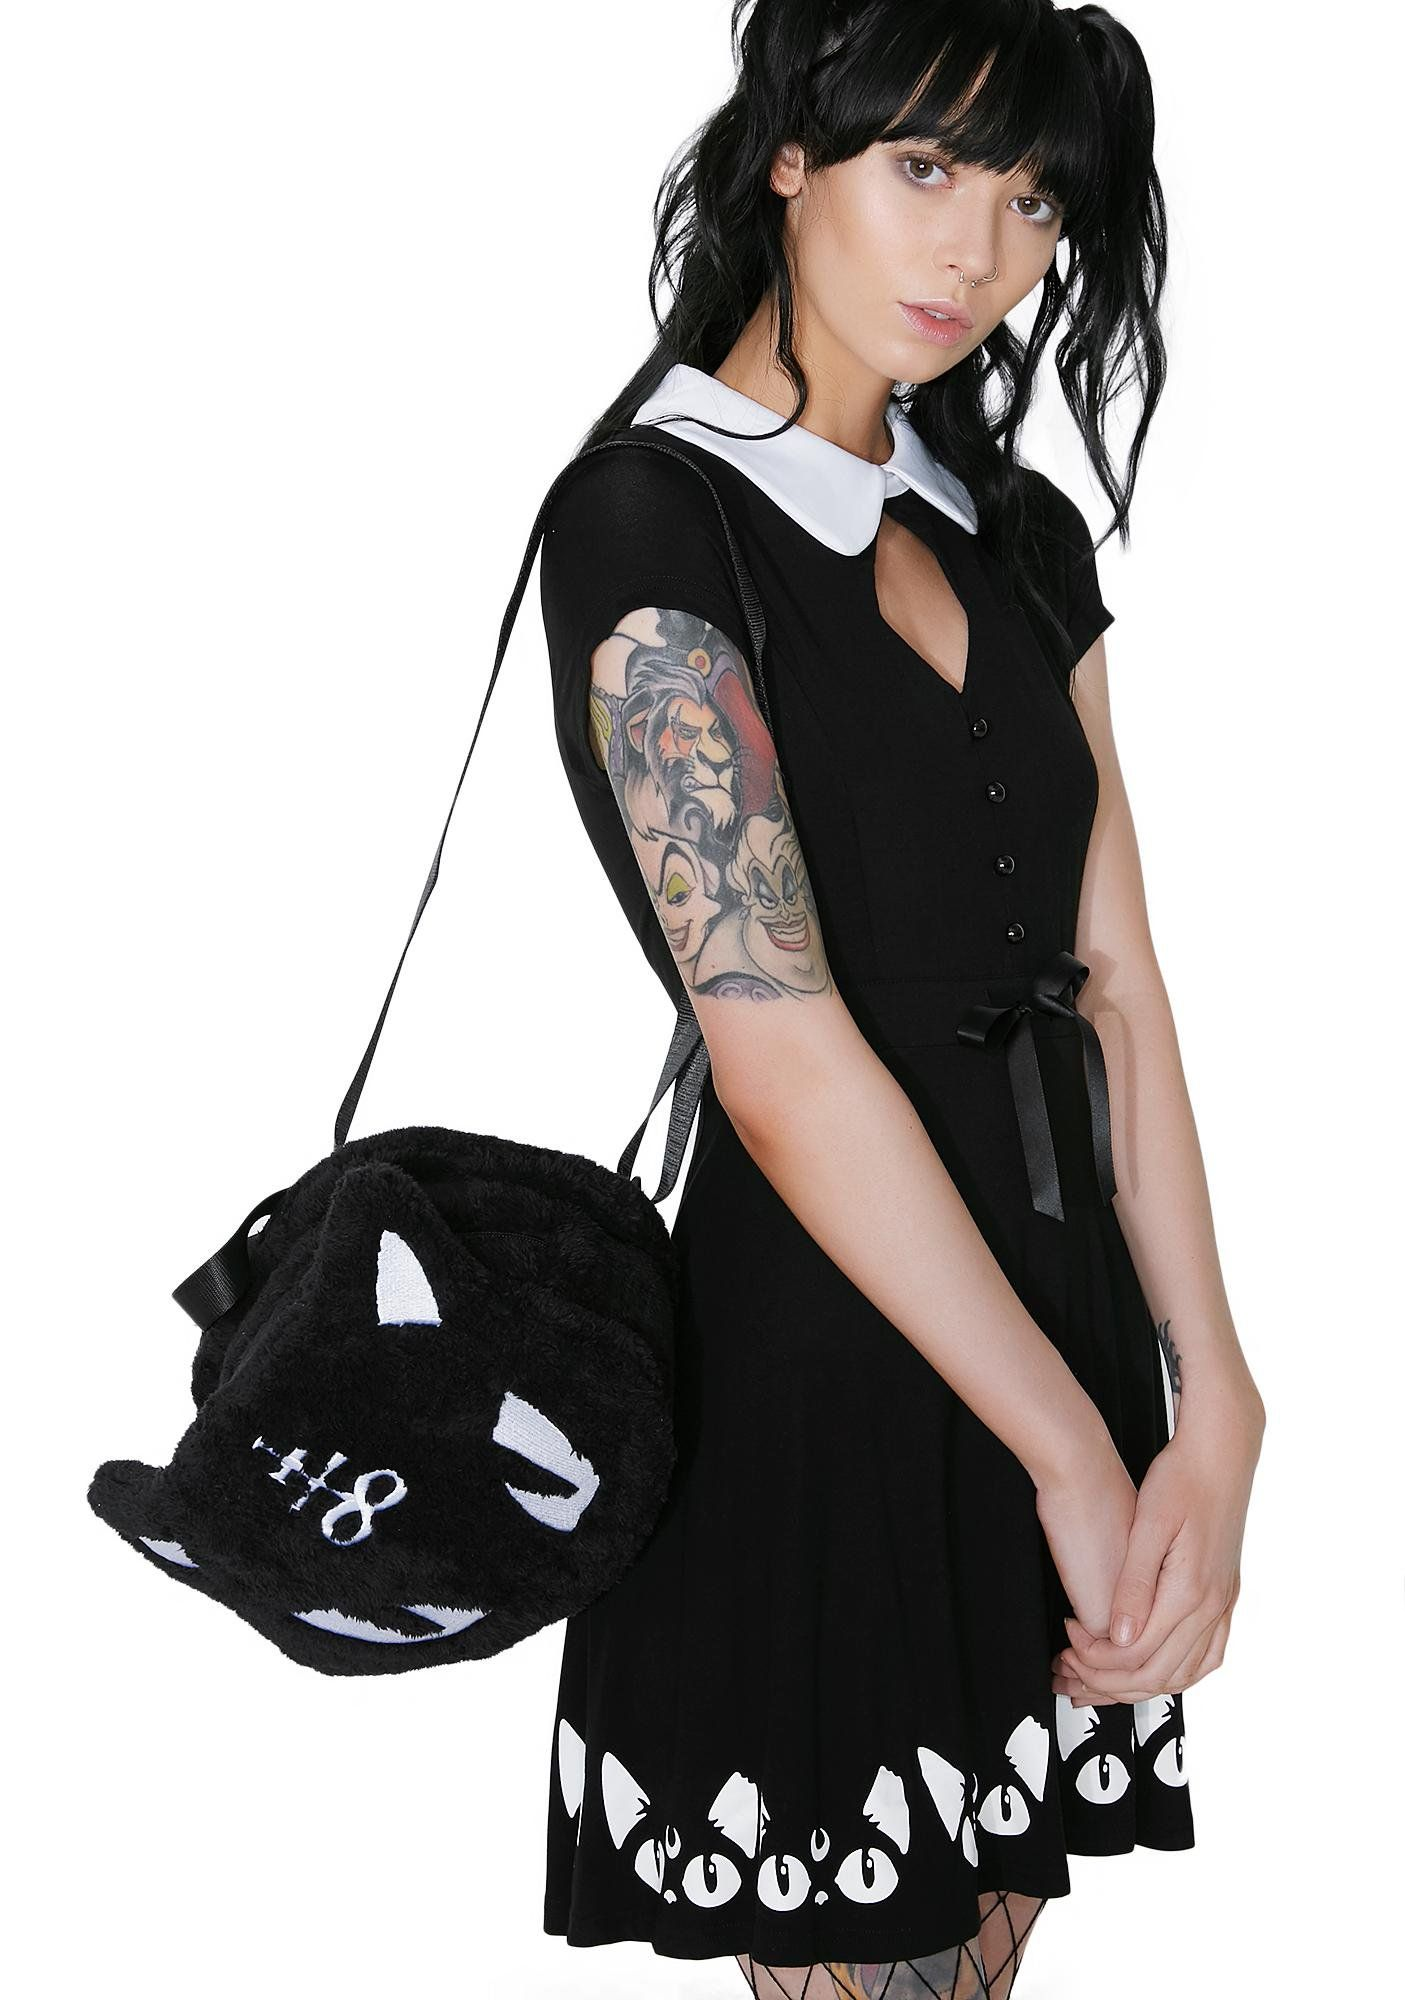 4375fcd2 Killstar Keiko Kitty Skater Dress Drawstring Waist, Skater Dress, Street  Wear, Cord